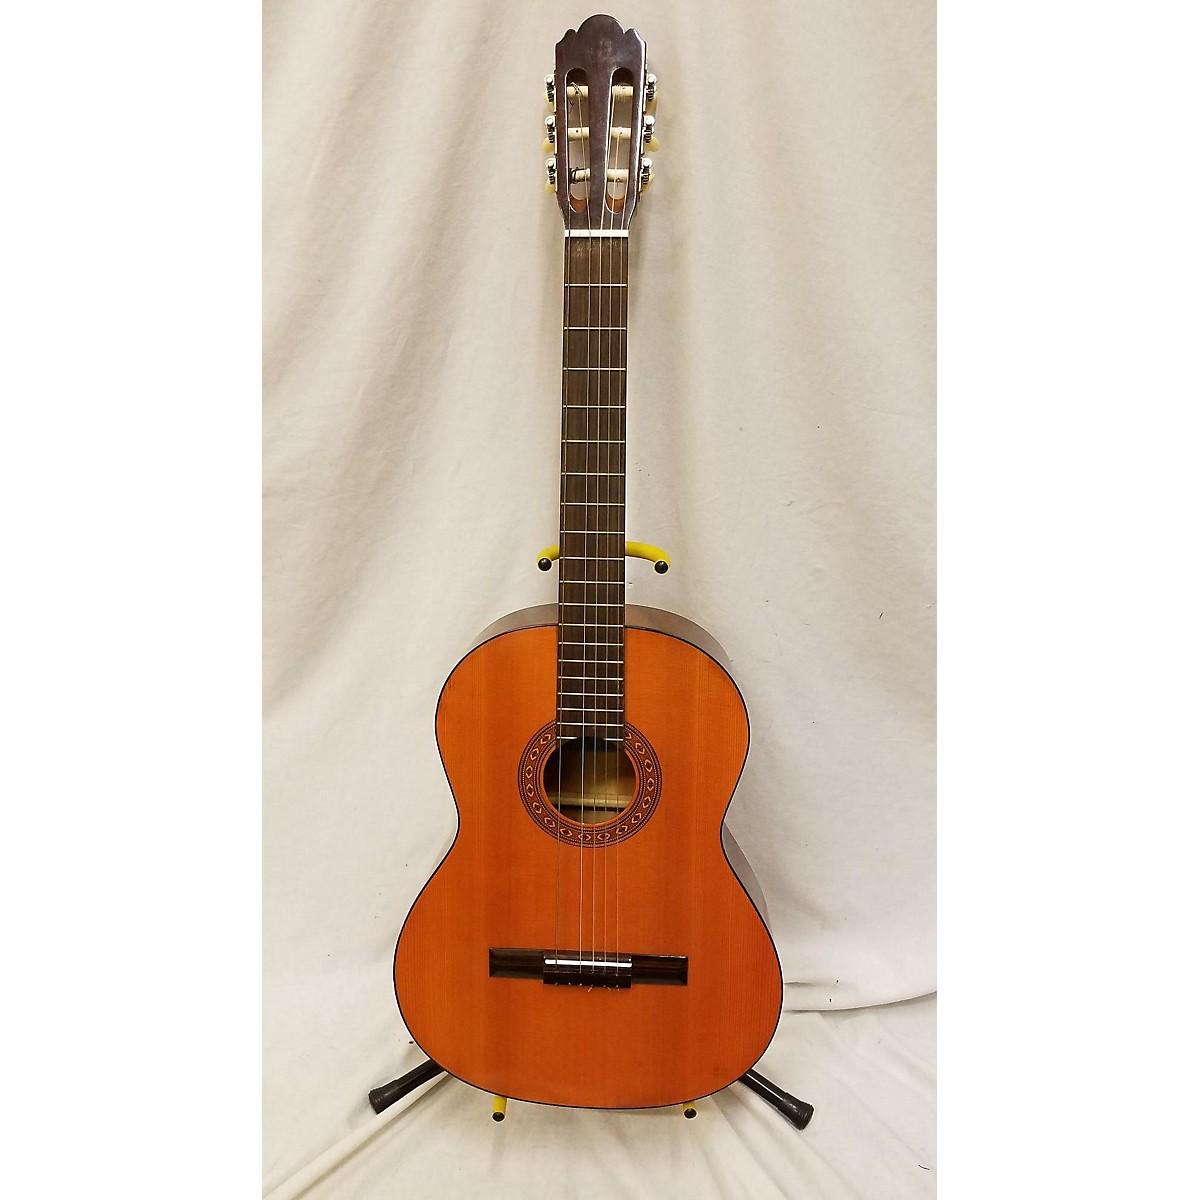 Epiphone 1970s EC15 CLASSICAL Acoustic Guitar